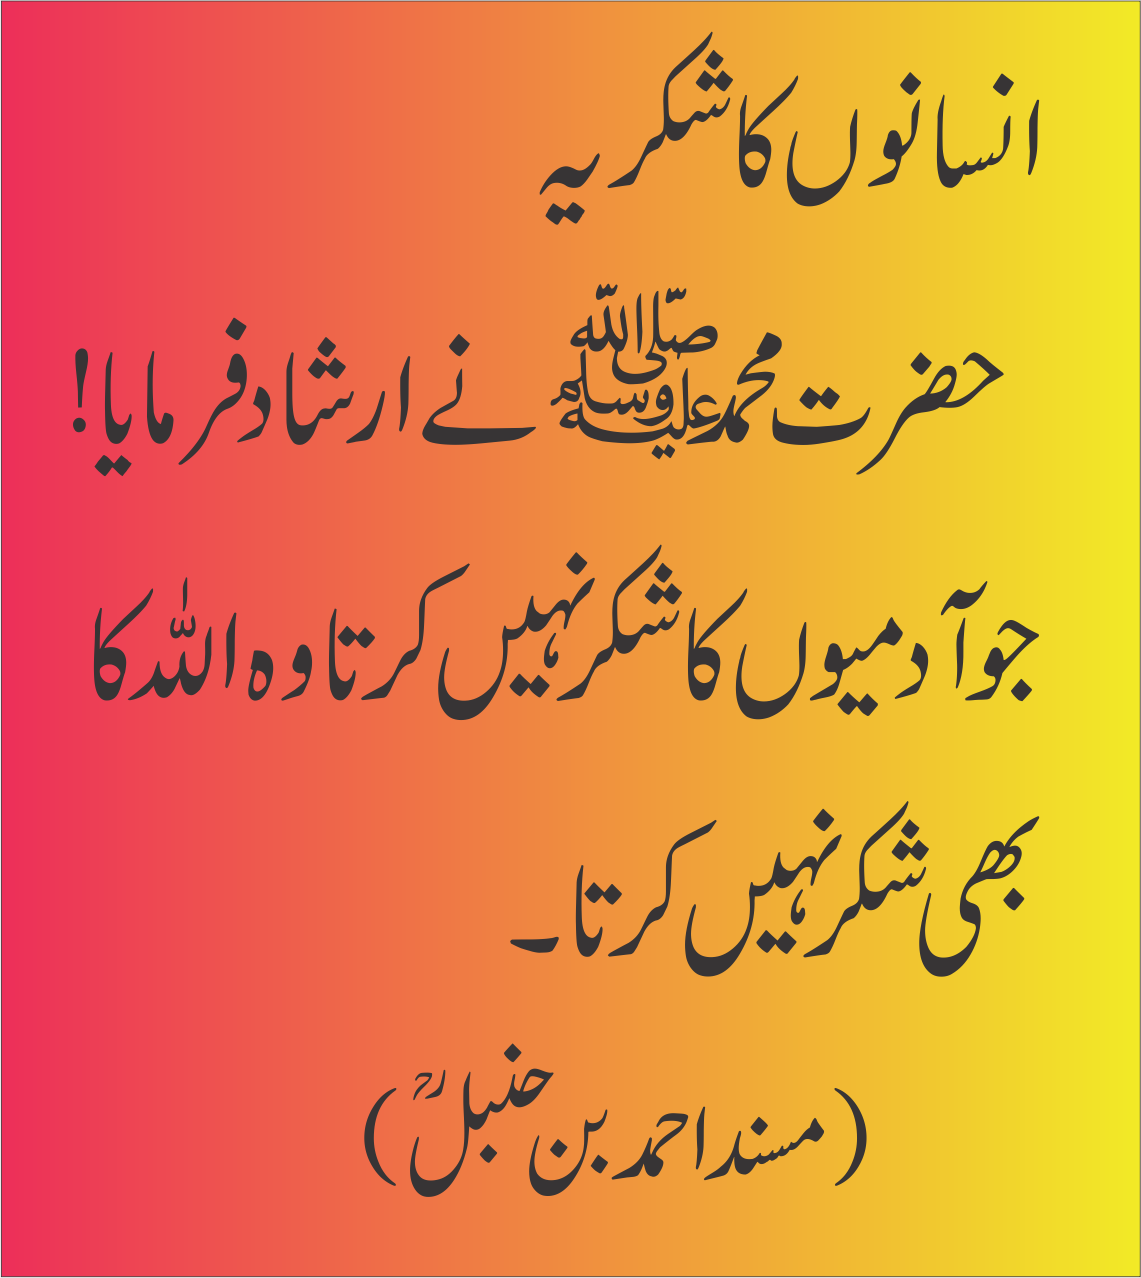 It's All About Islam: Ahadees About Shukar Guzari